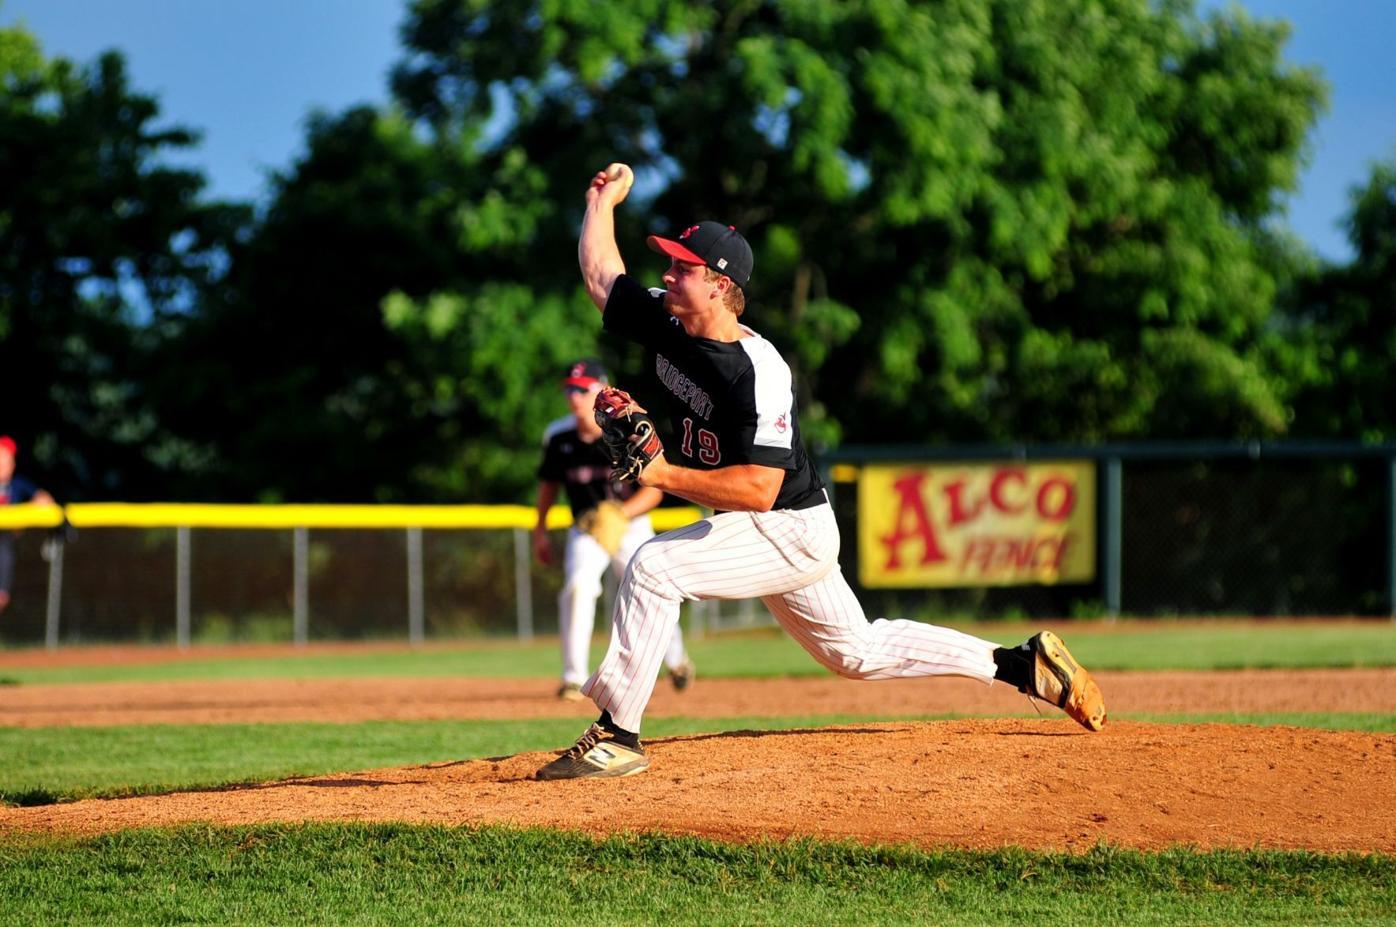 bport pitcher.JPG